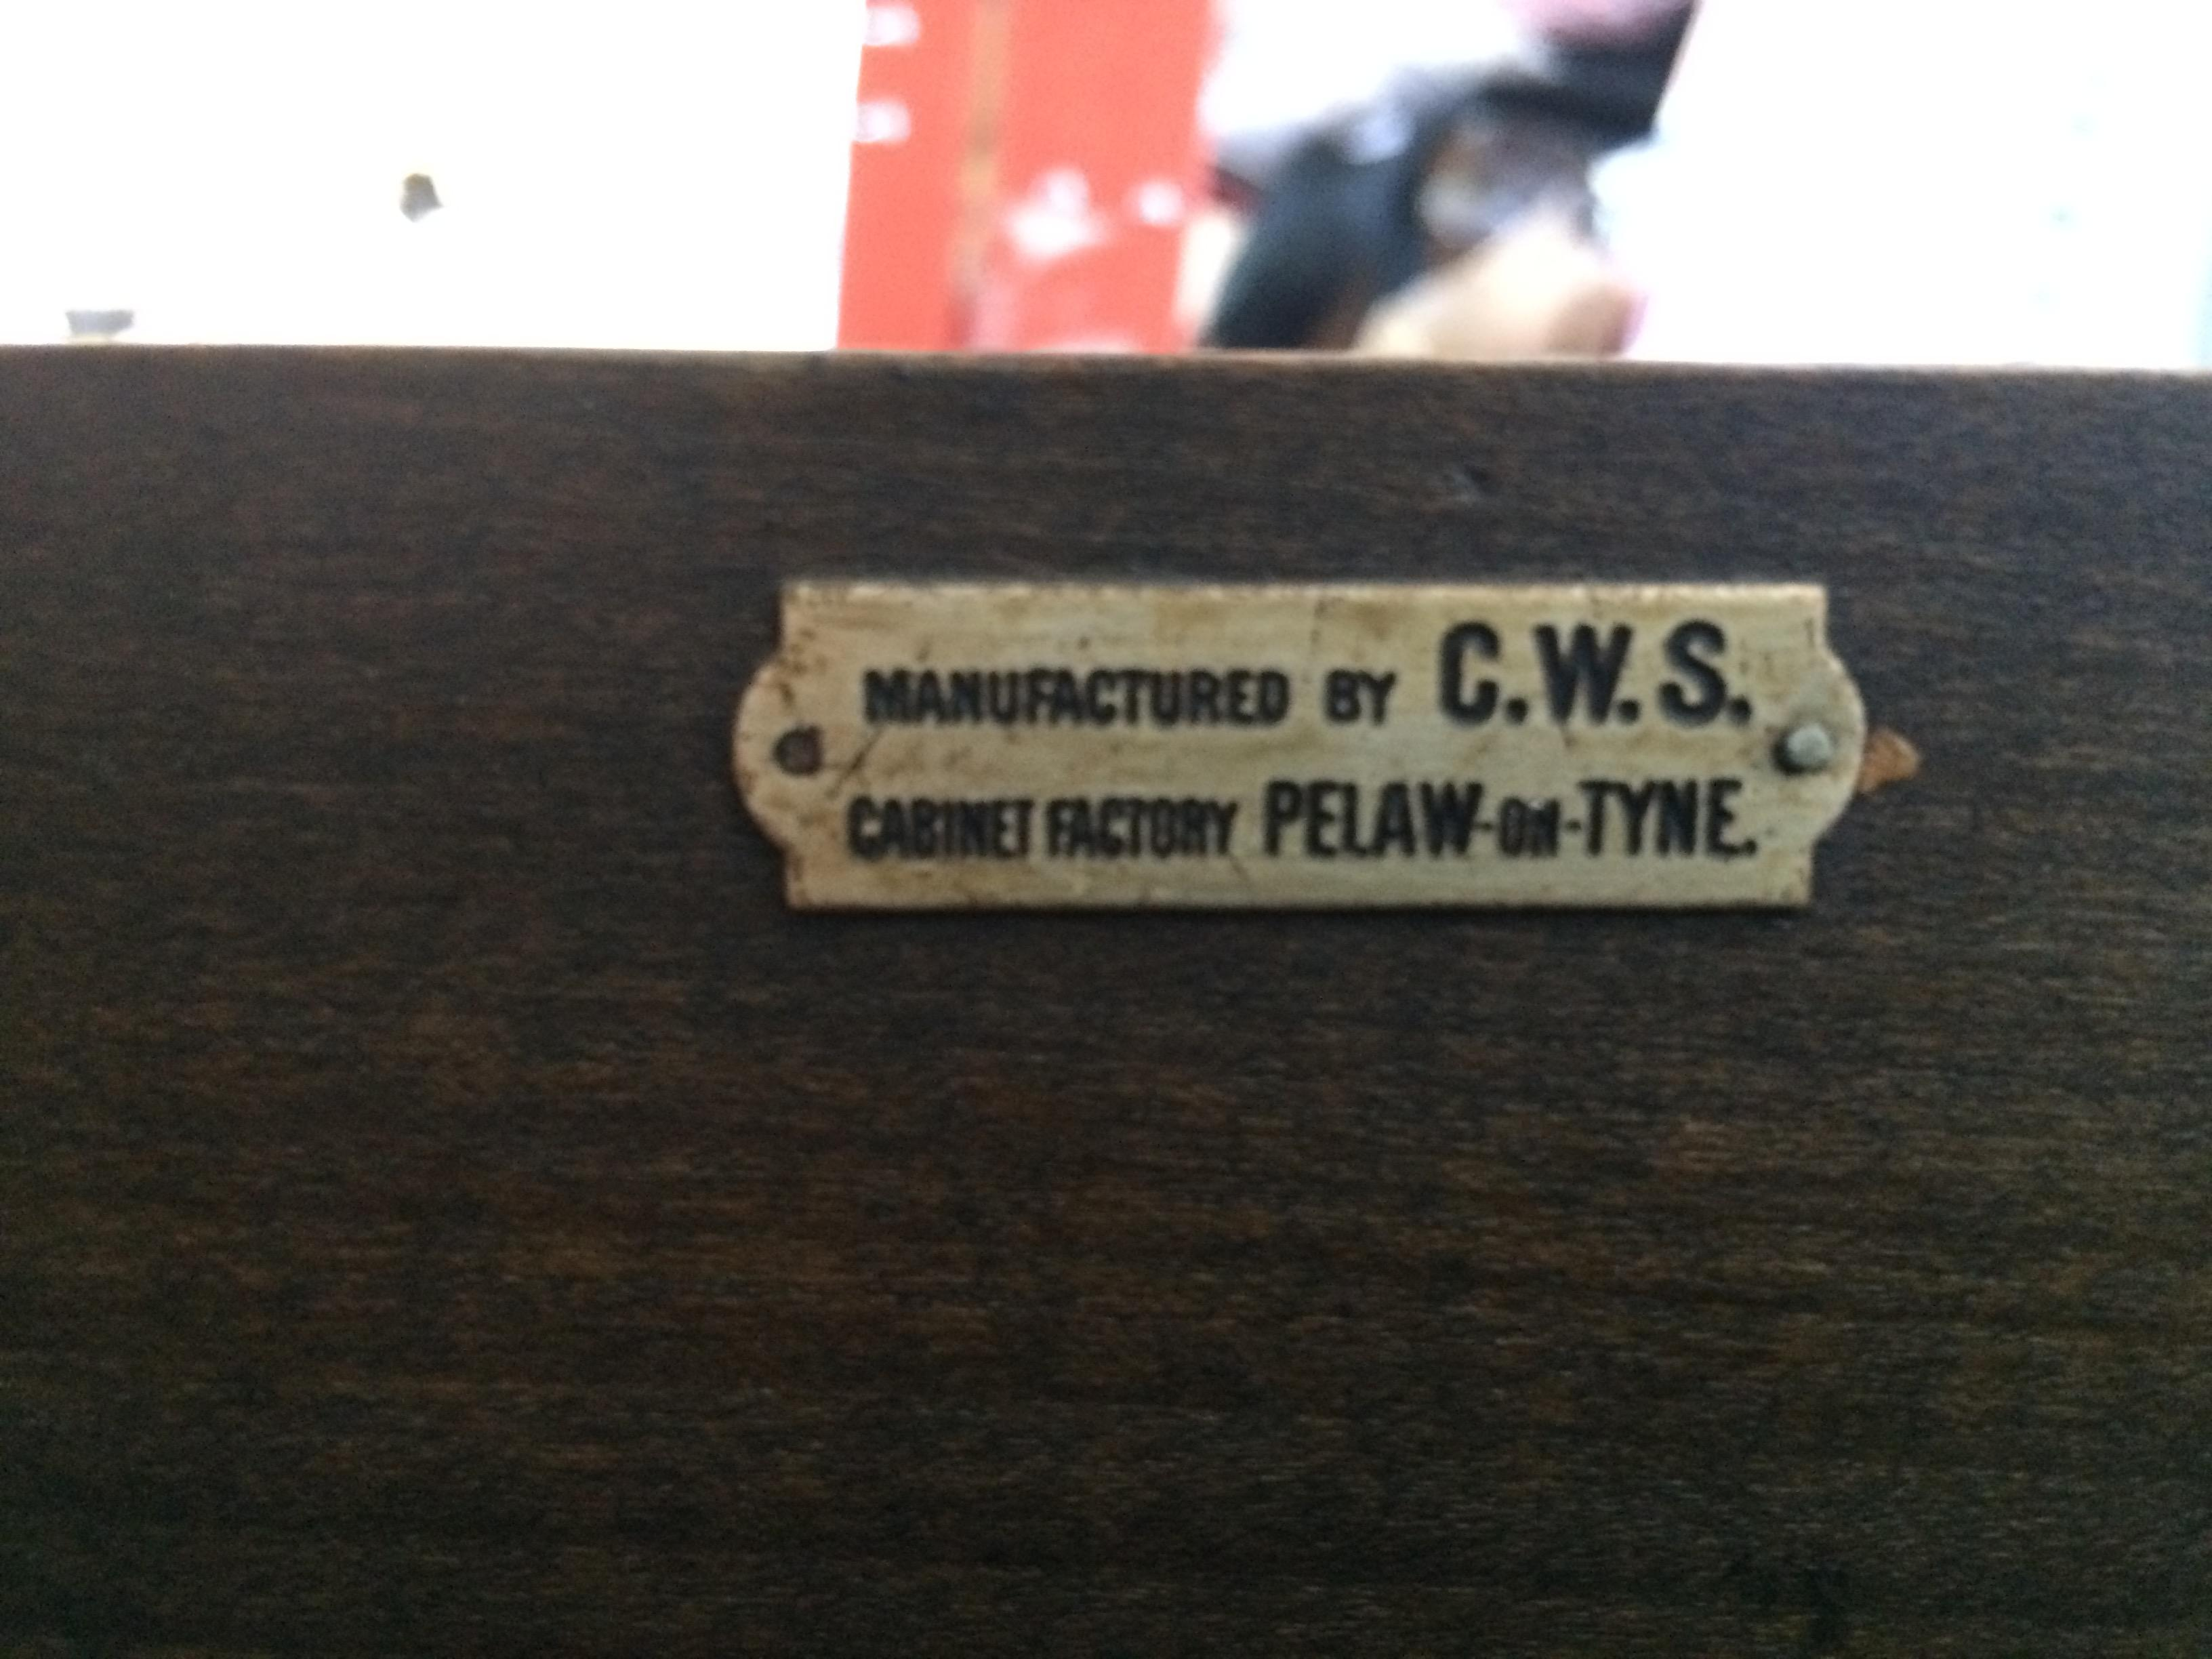 cws pelaw antique. Delighful Antique CWS Cabinet Factory PelawonTyne Inside Cws Pelaw Antique W